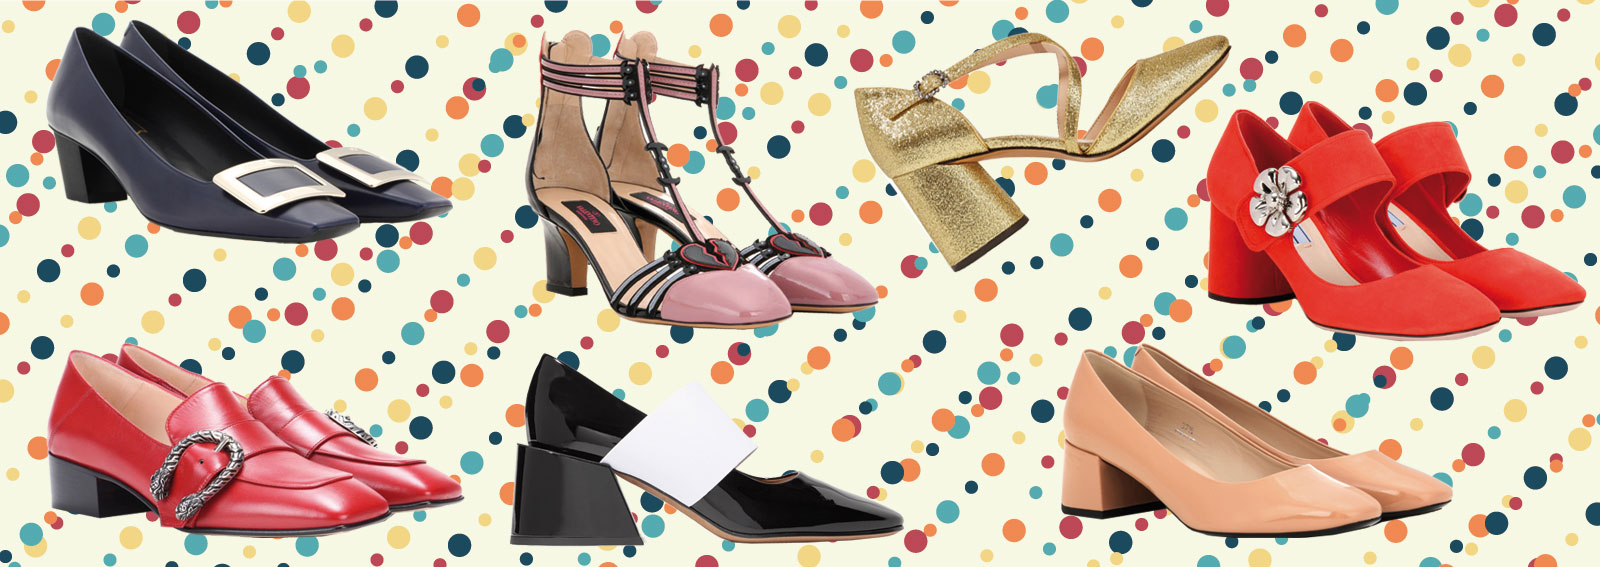 DESKTOP_scarpe_punta_quadrate